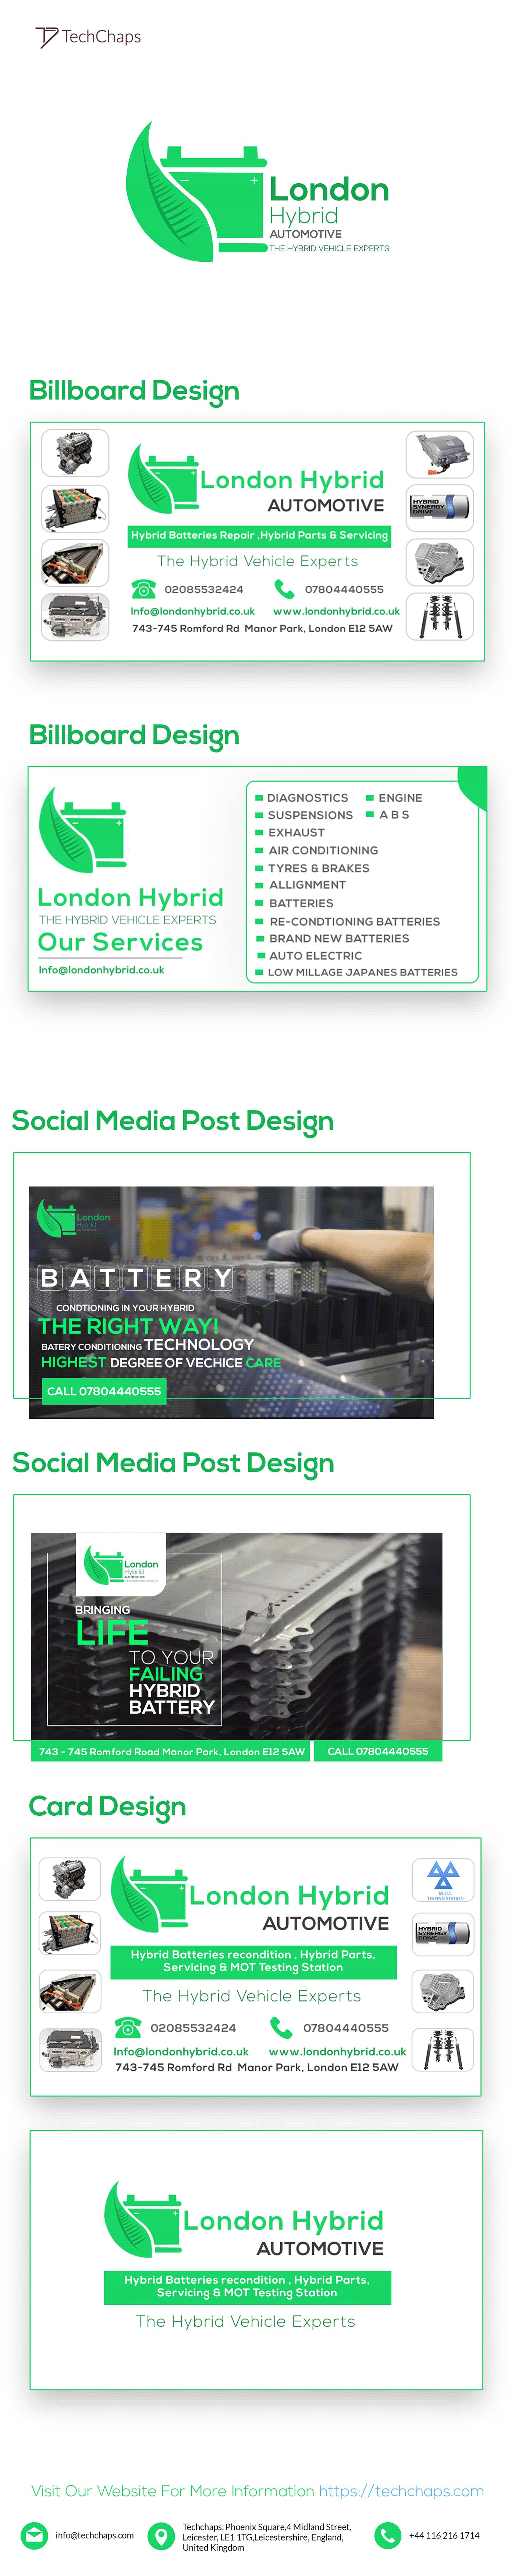 banners billboard design Brand Design brand identity branding  Business Cards creative designs Logo Design social media posts Technology